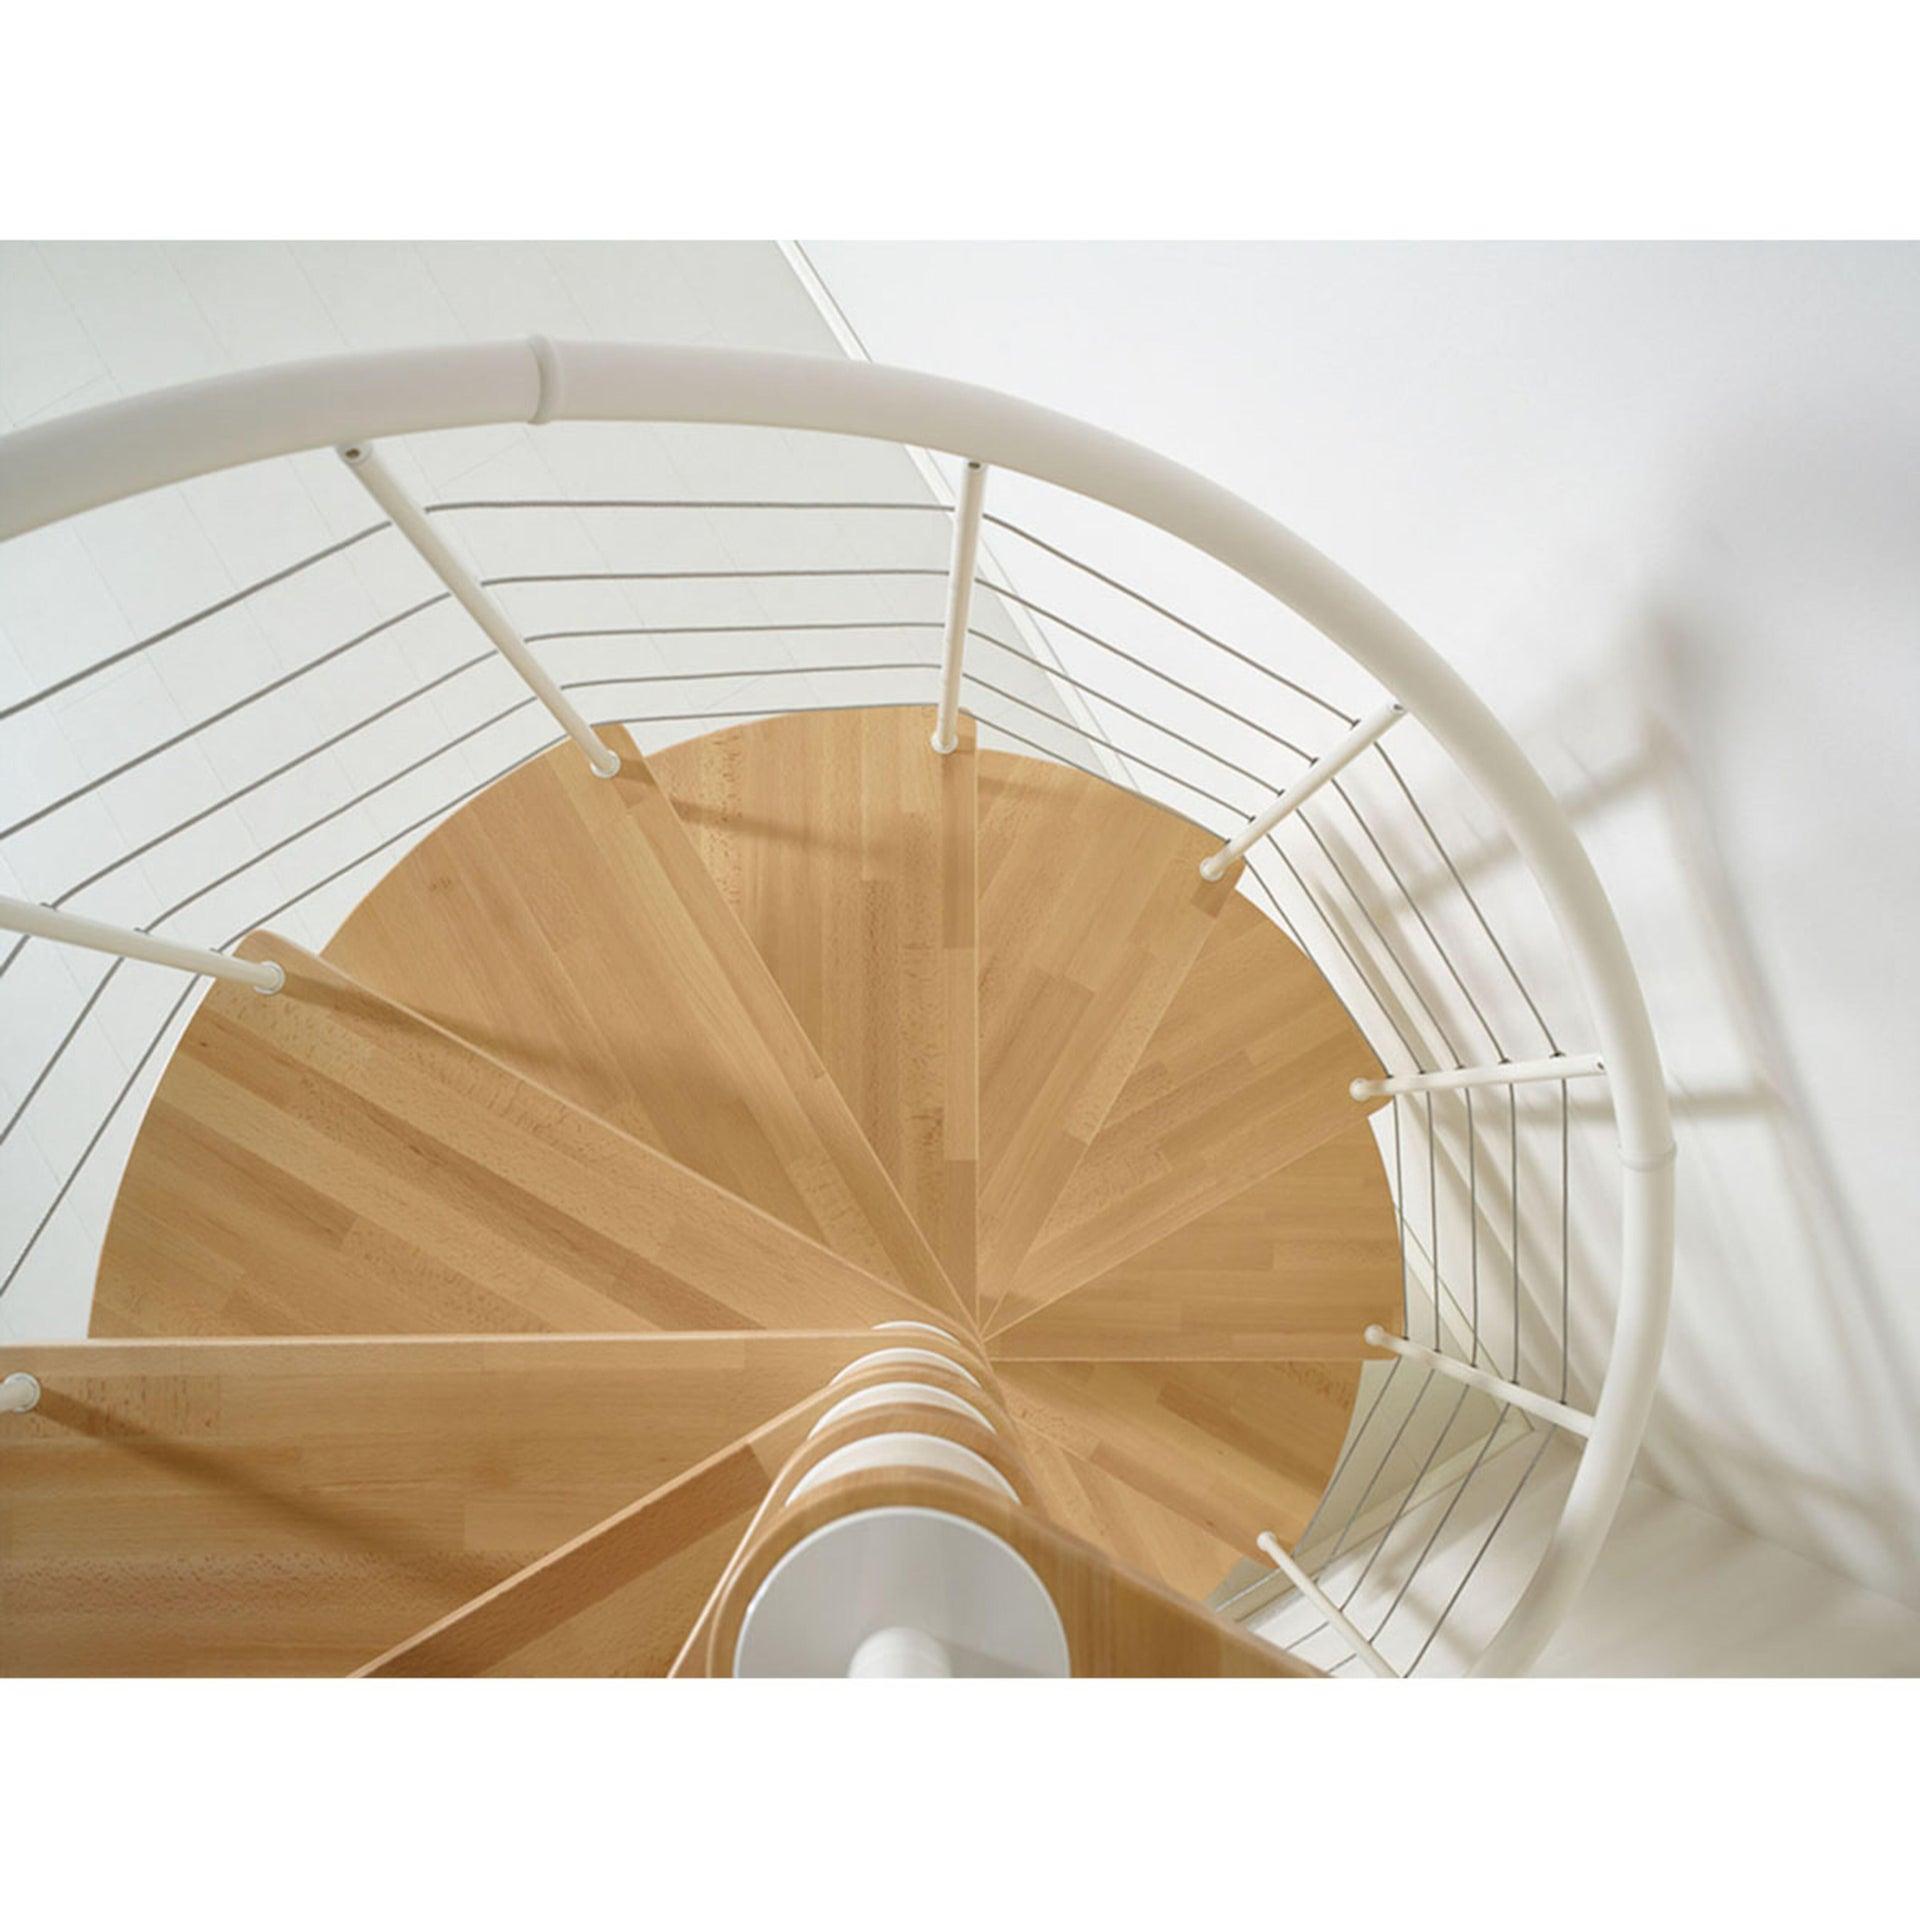 Scala a chiocciola tonda Symphonie FONTANOT L 120 cm, gradino noce, struttura bianco - 6